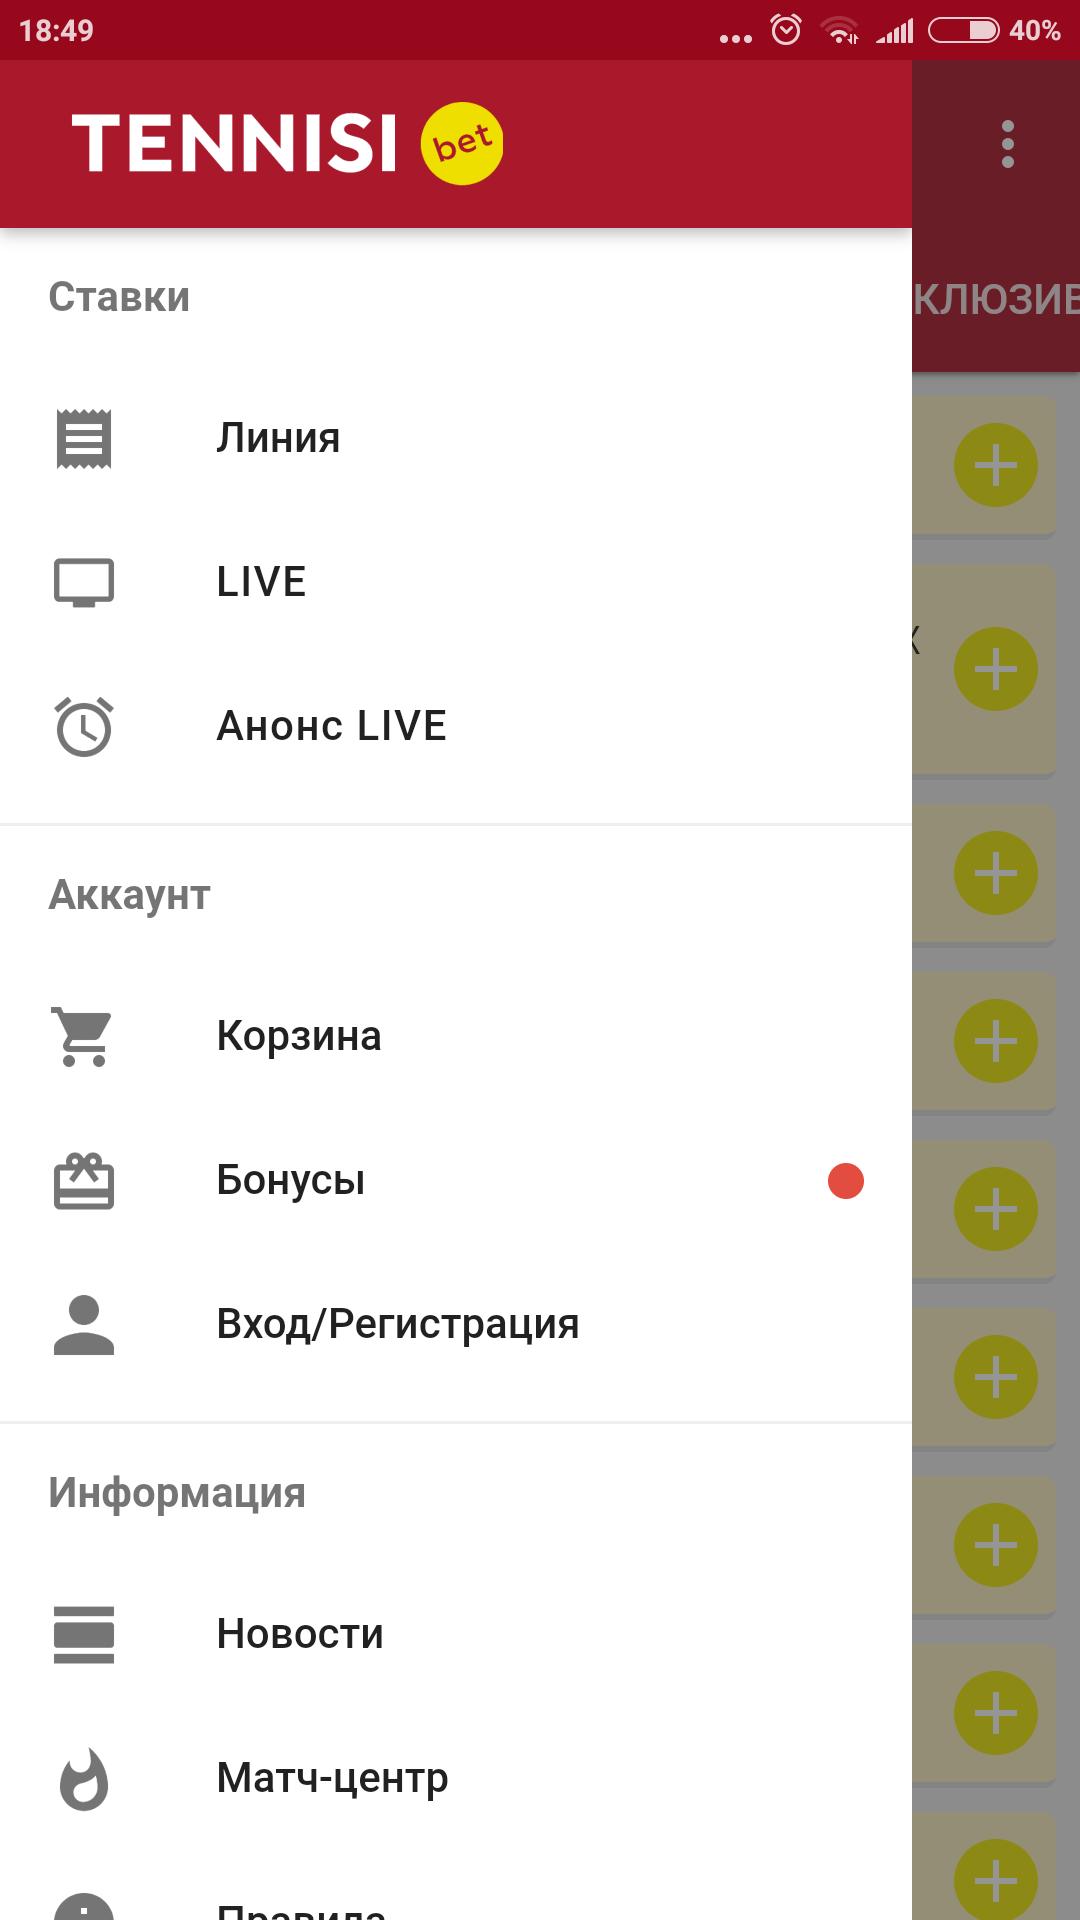 Как выглядит приложение на андроид бк тенниси